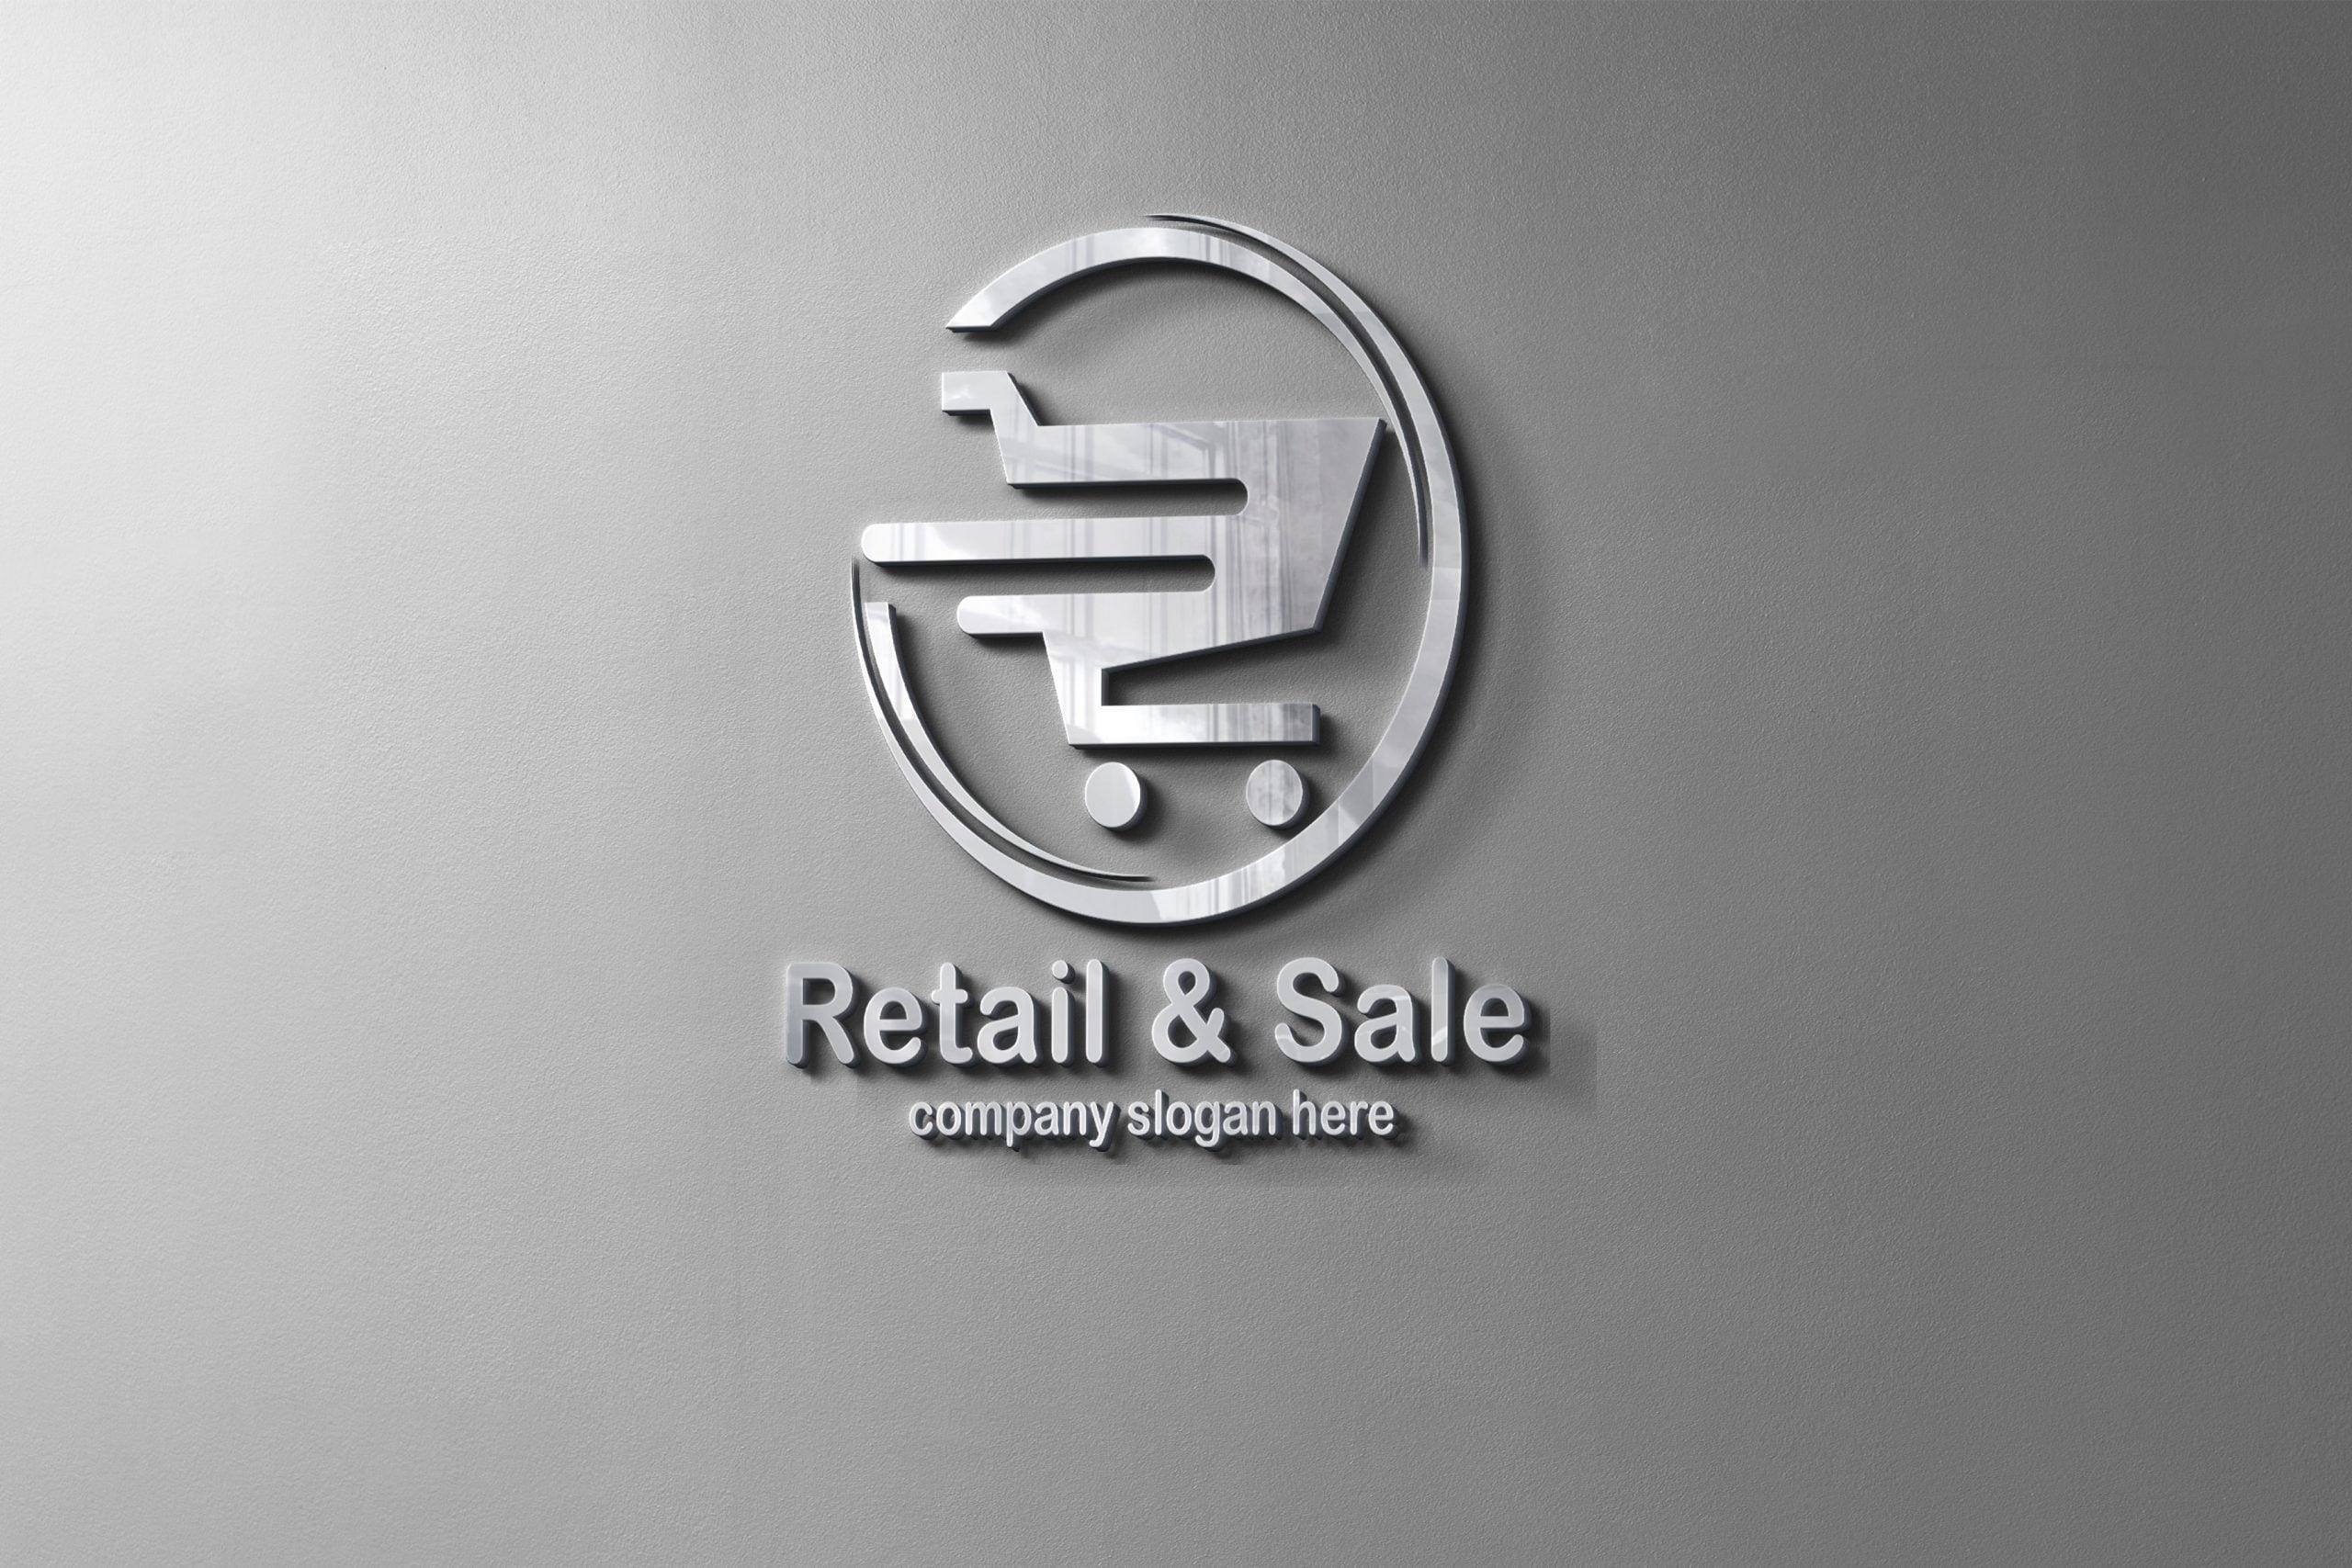 Online shopping logo design presentation